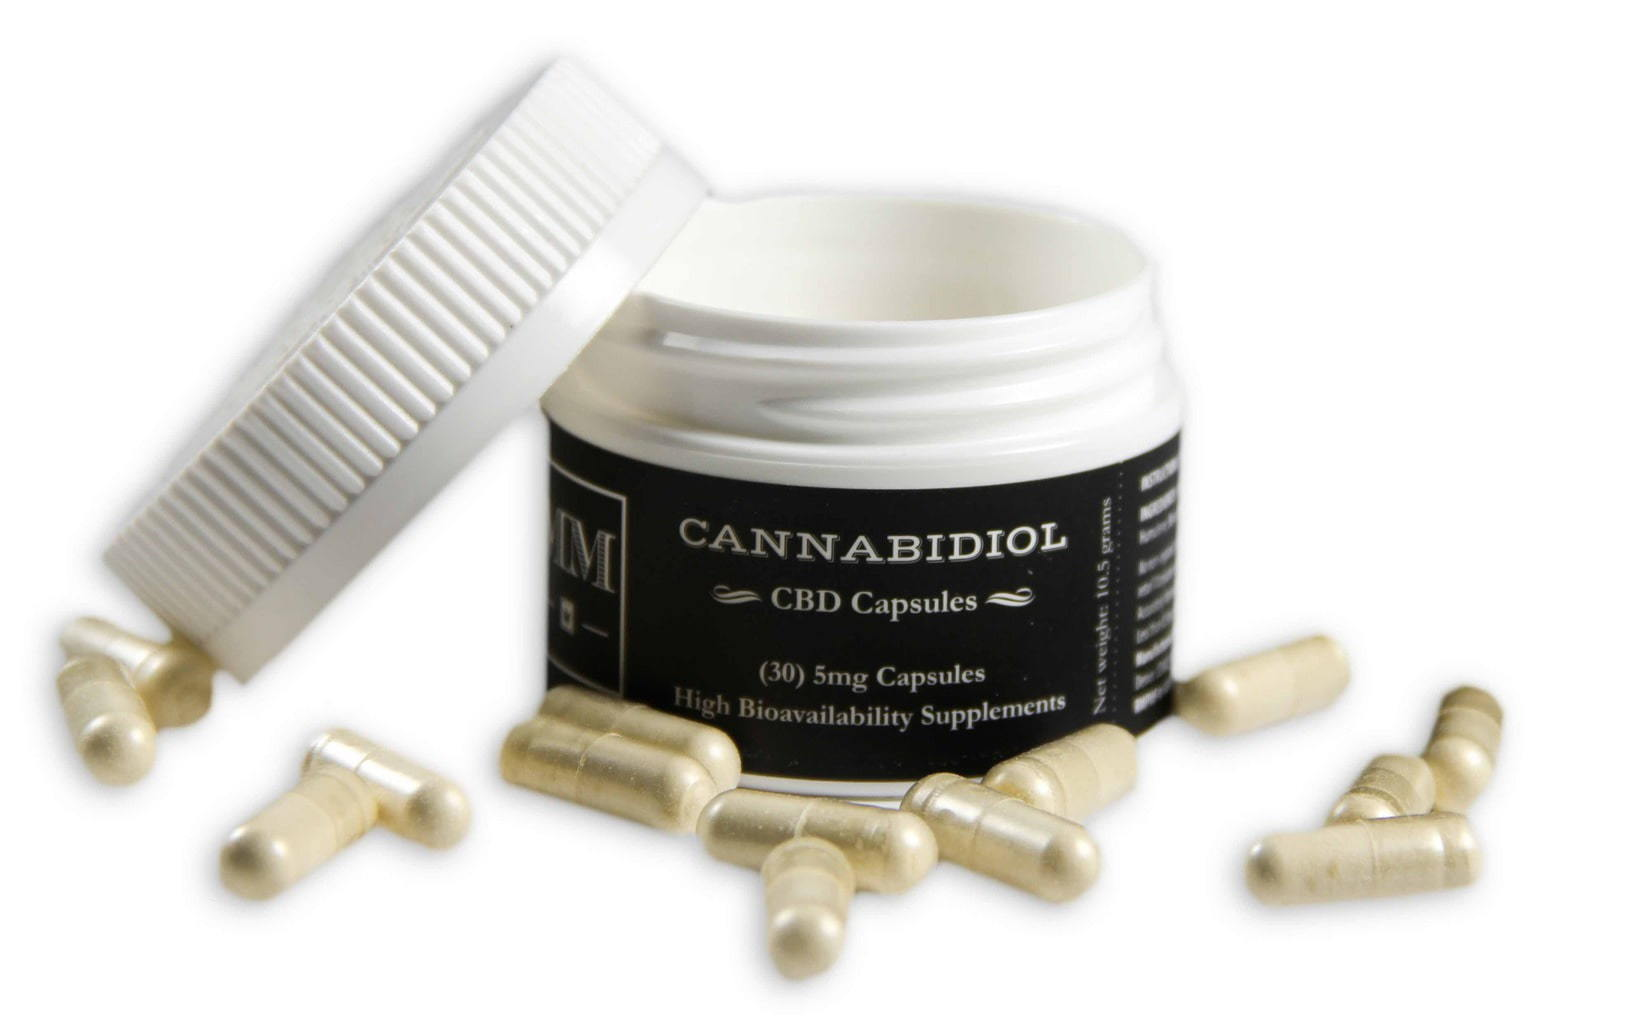 mary's medicinals cbd/cbn capsules